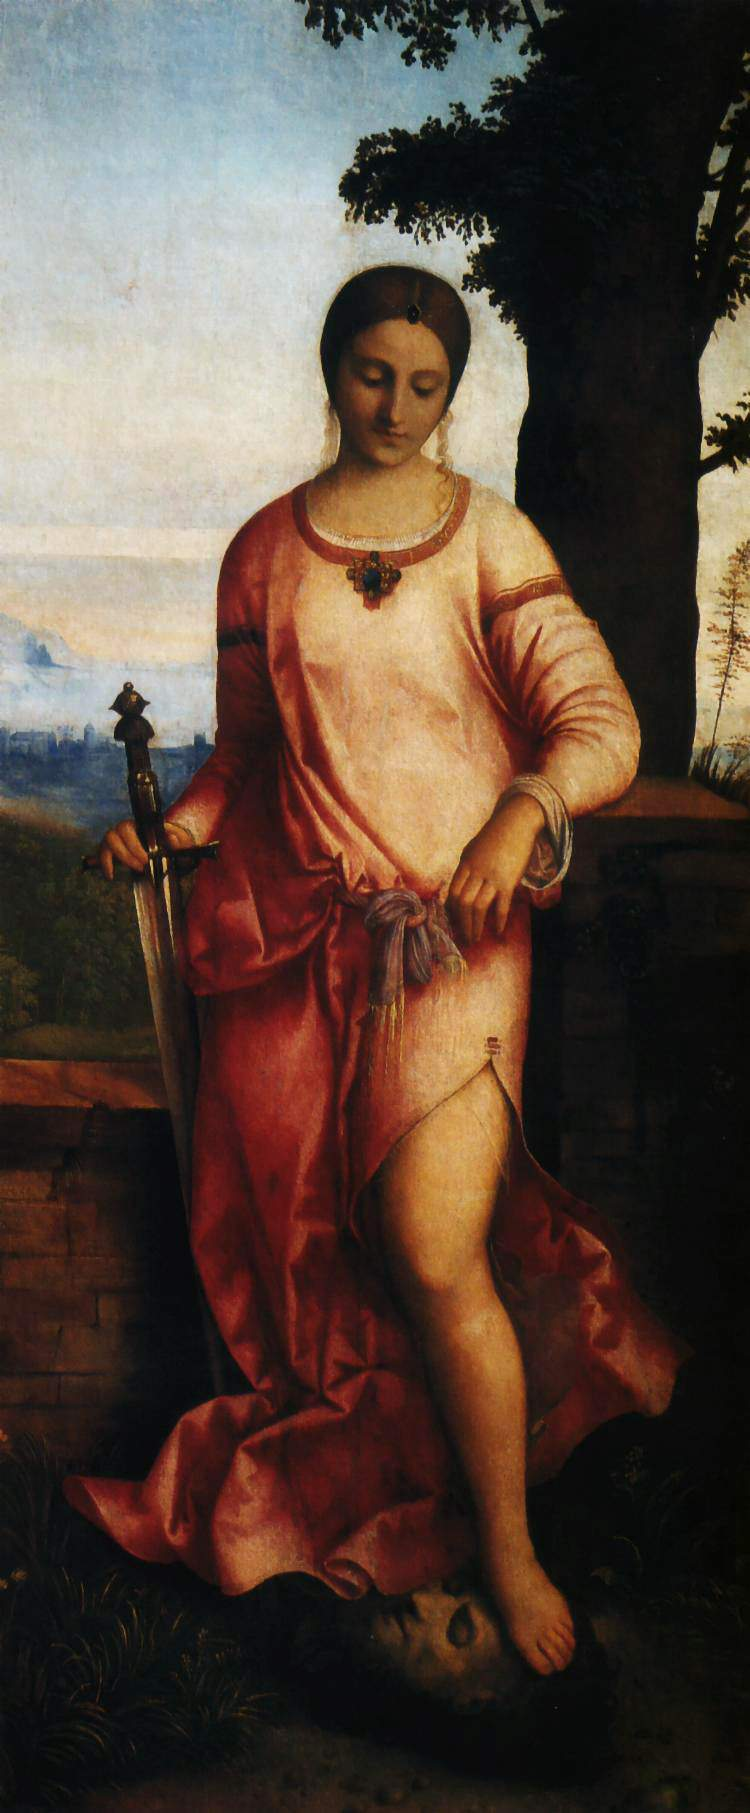 http://sschool8.narod.ru/Masters/Giorgione/01.jpg